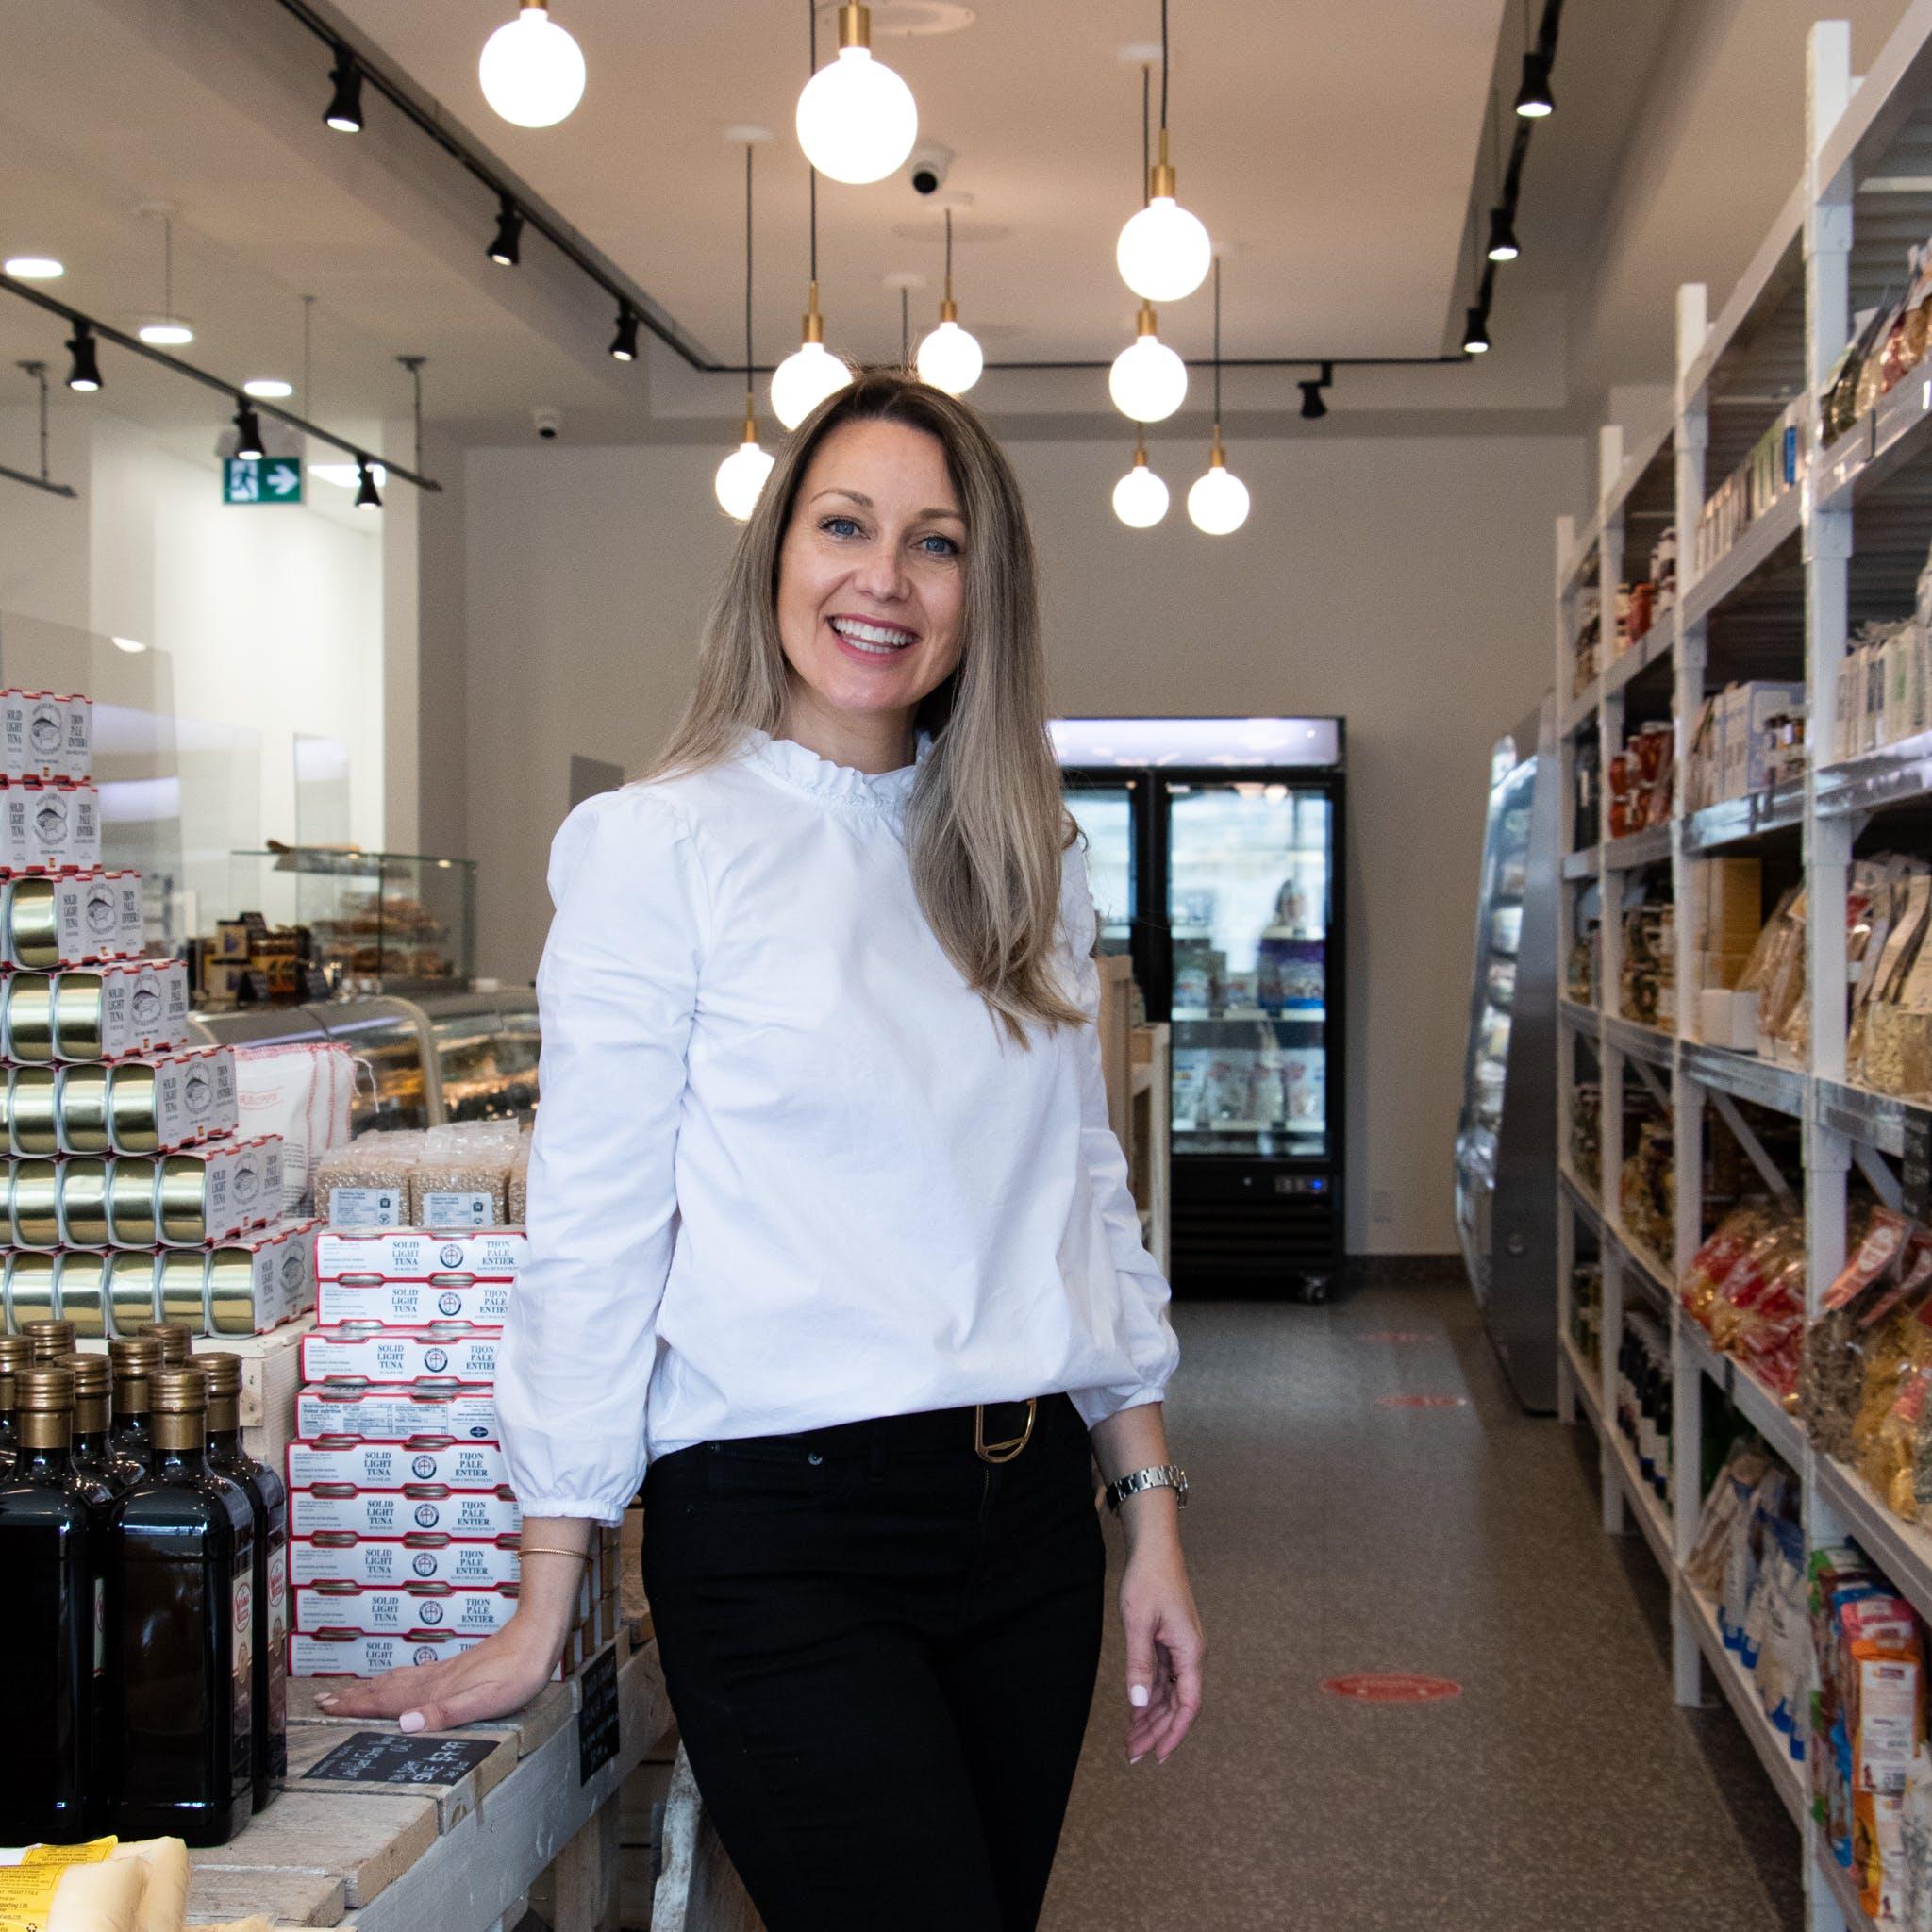 Katerina Adams, owner of La Spesa Food Market. Image by: @paothebao